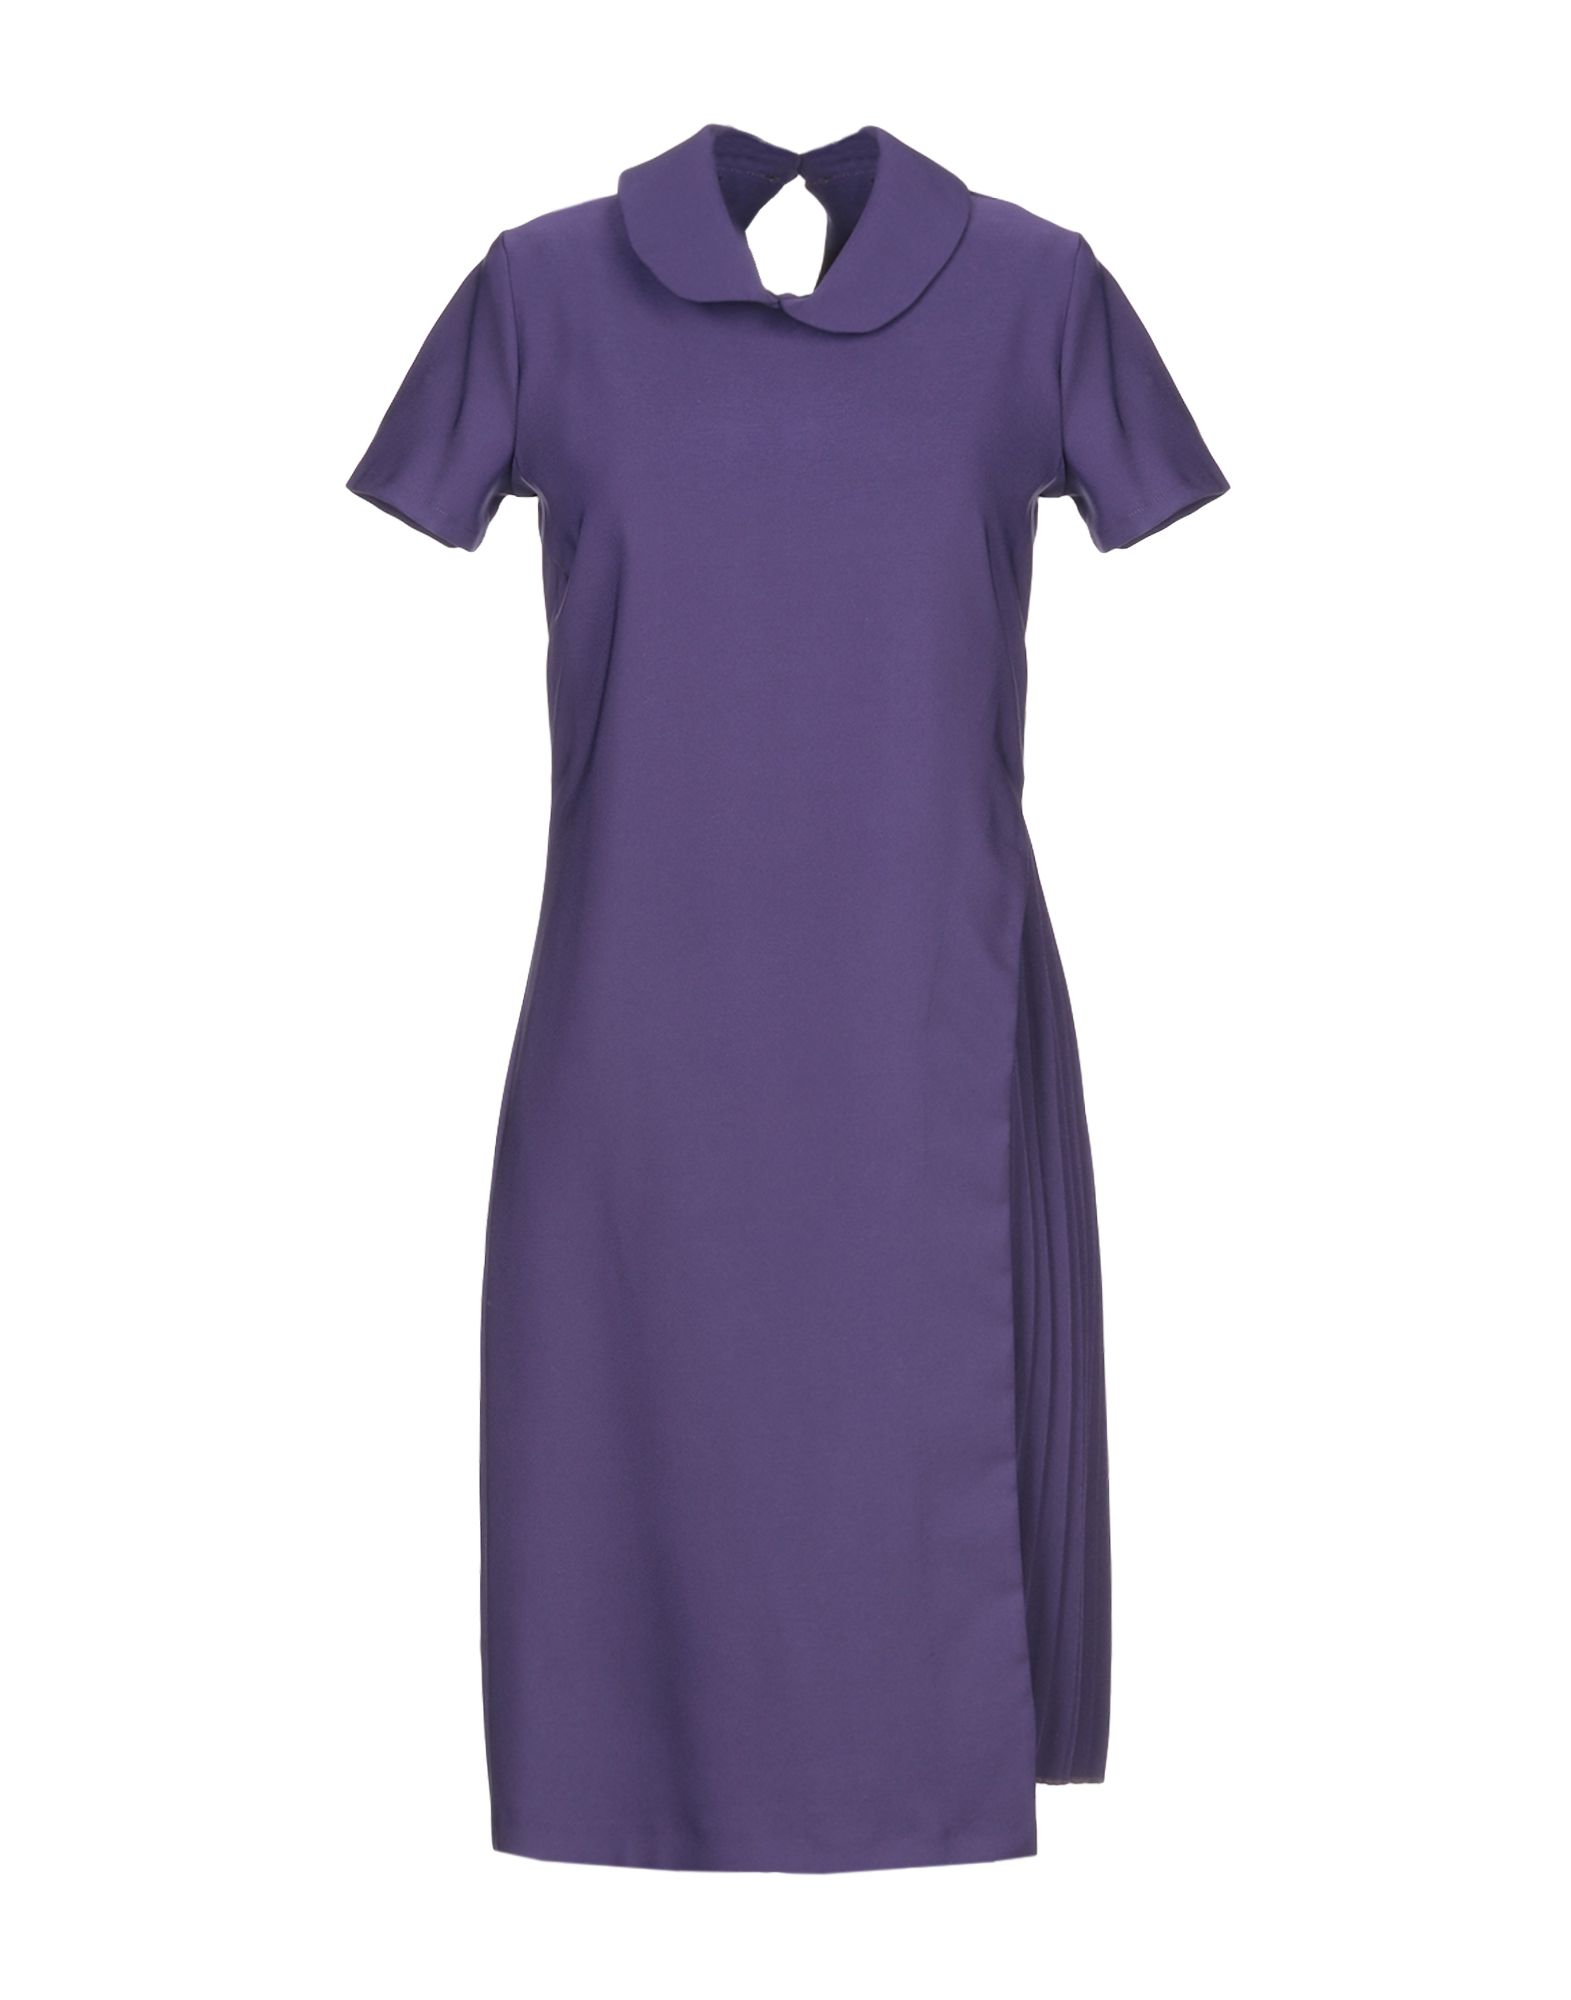 6a5cb4ecb20 SISTE  S Короткое платье